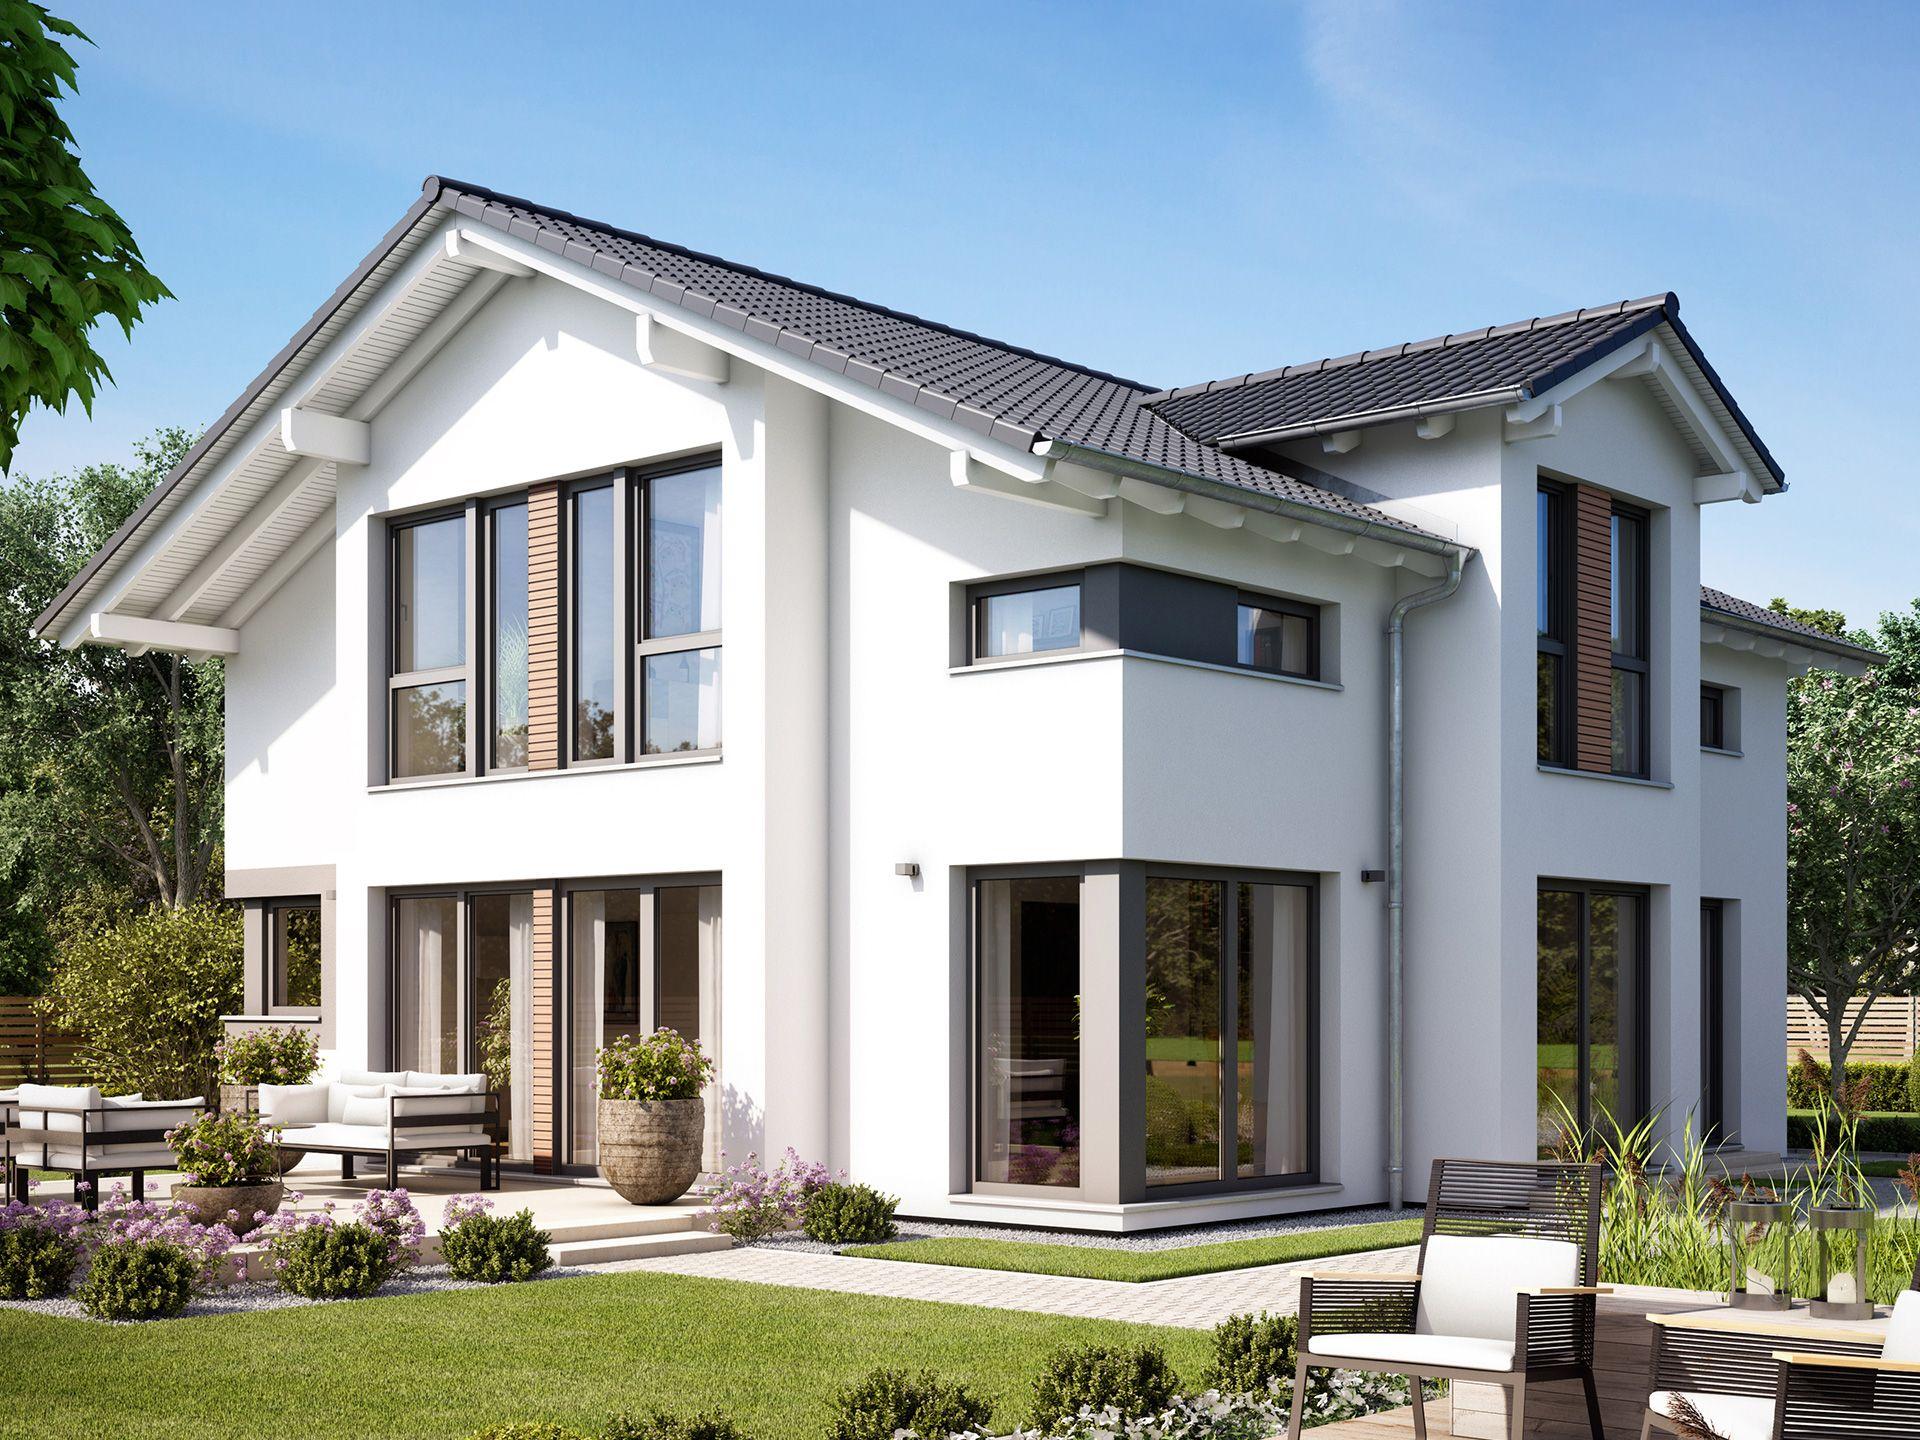 Einfamilienhaus FANTASTIC 161 V4 BienZenker